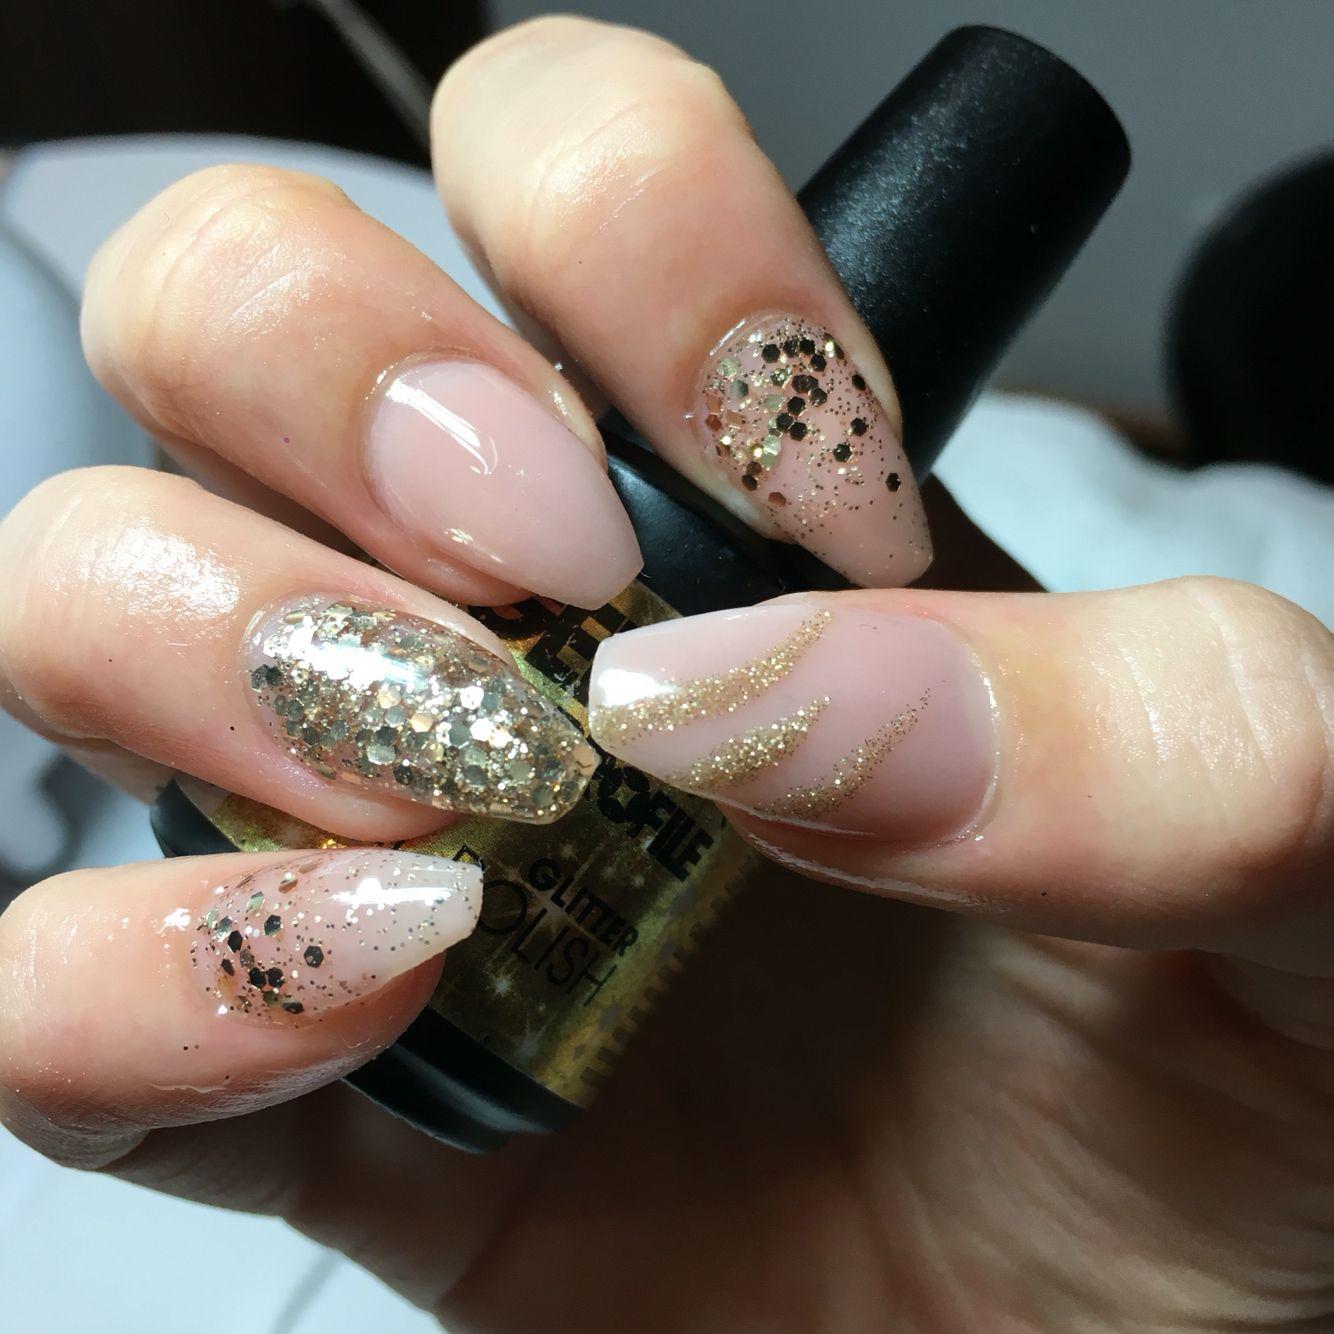 Nsi acrylic nails, no polish, home mixed acrylic glitter, gold ...